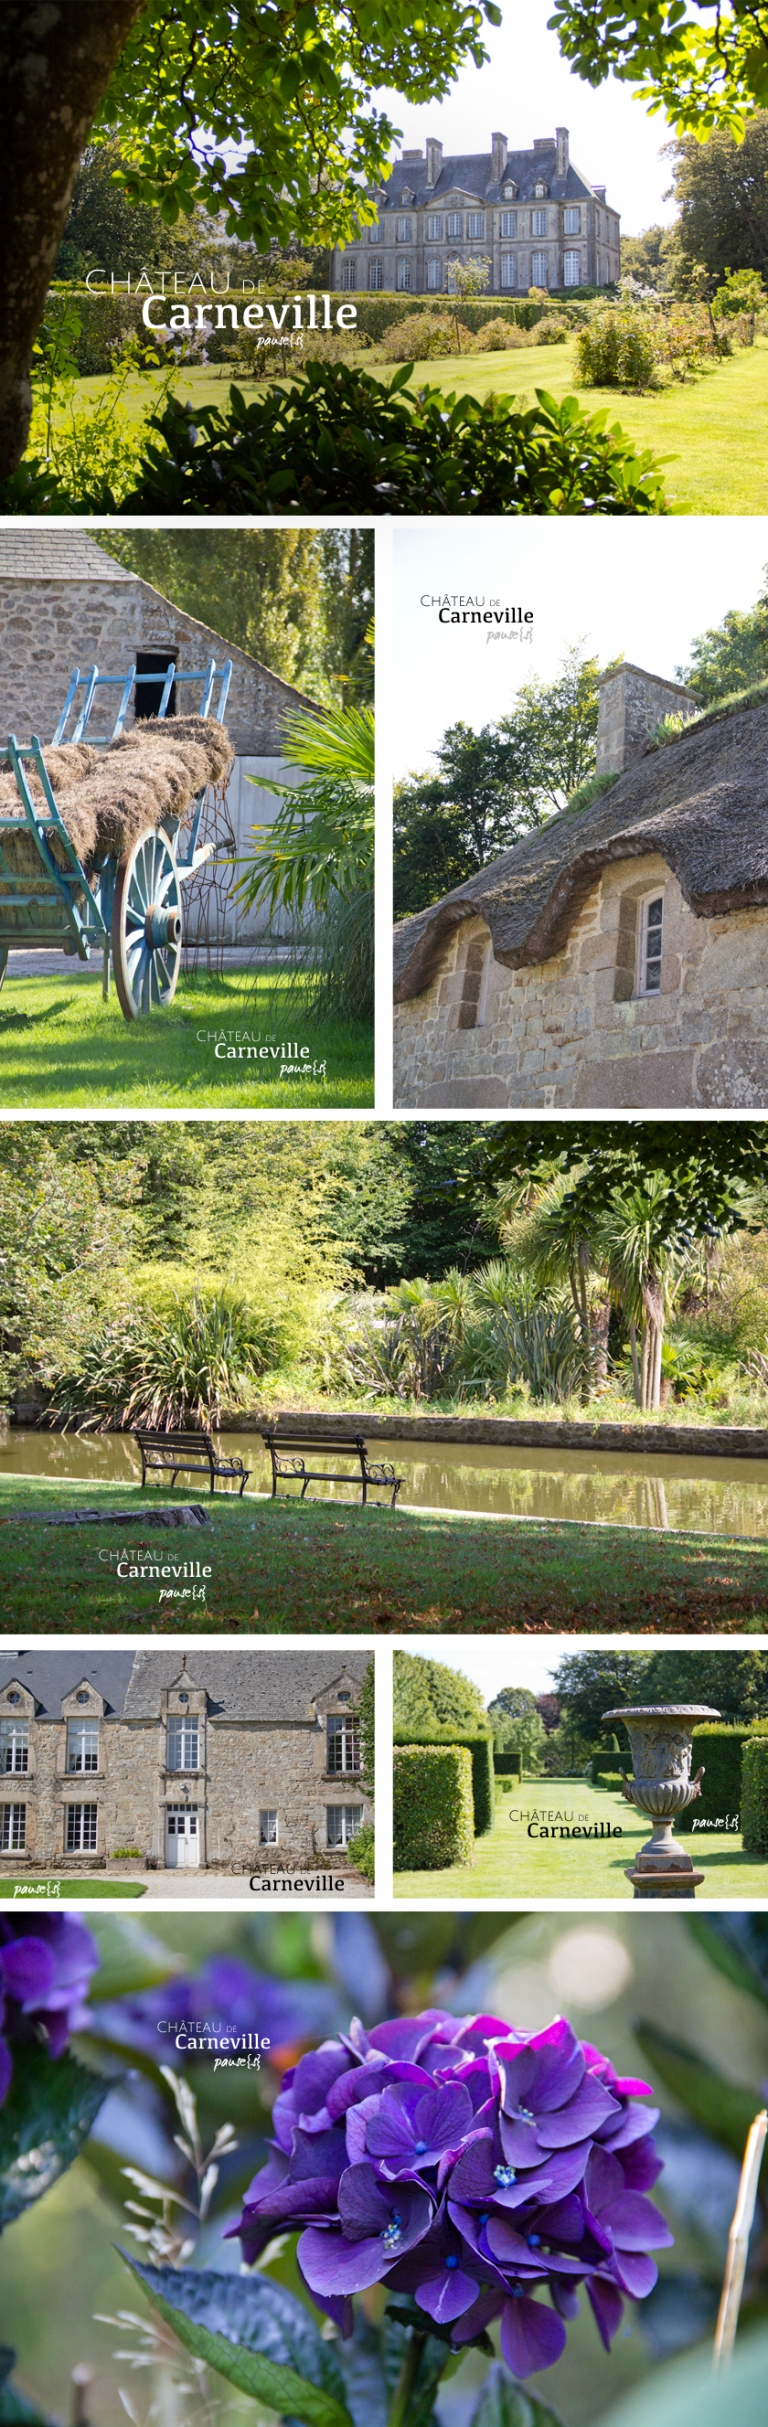 chateau_carneville_01